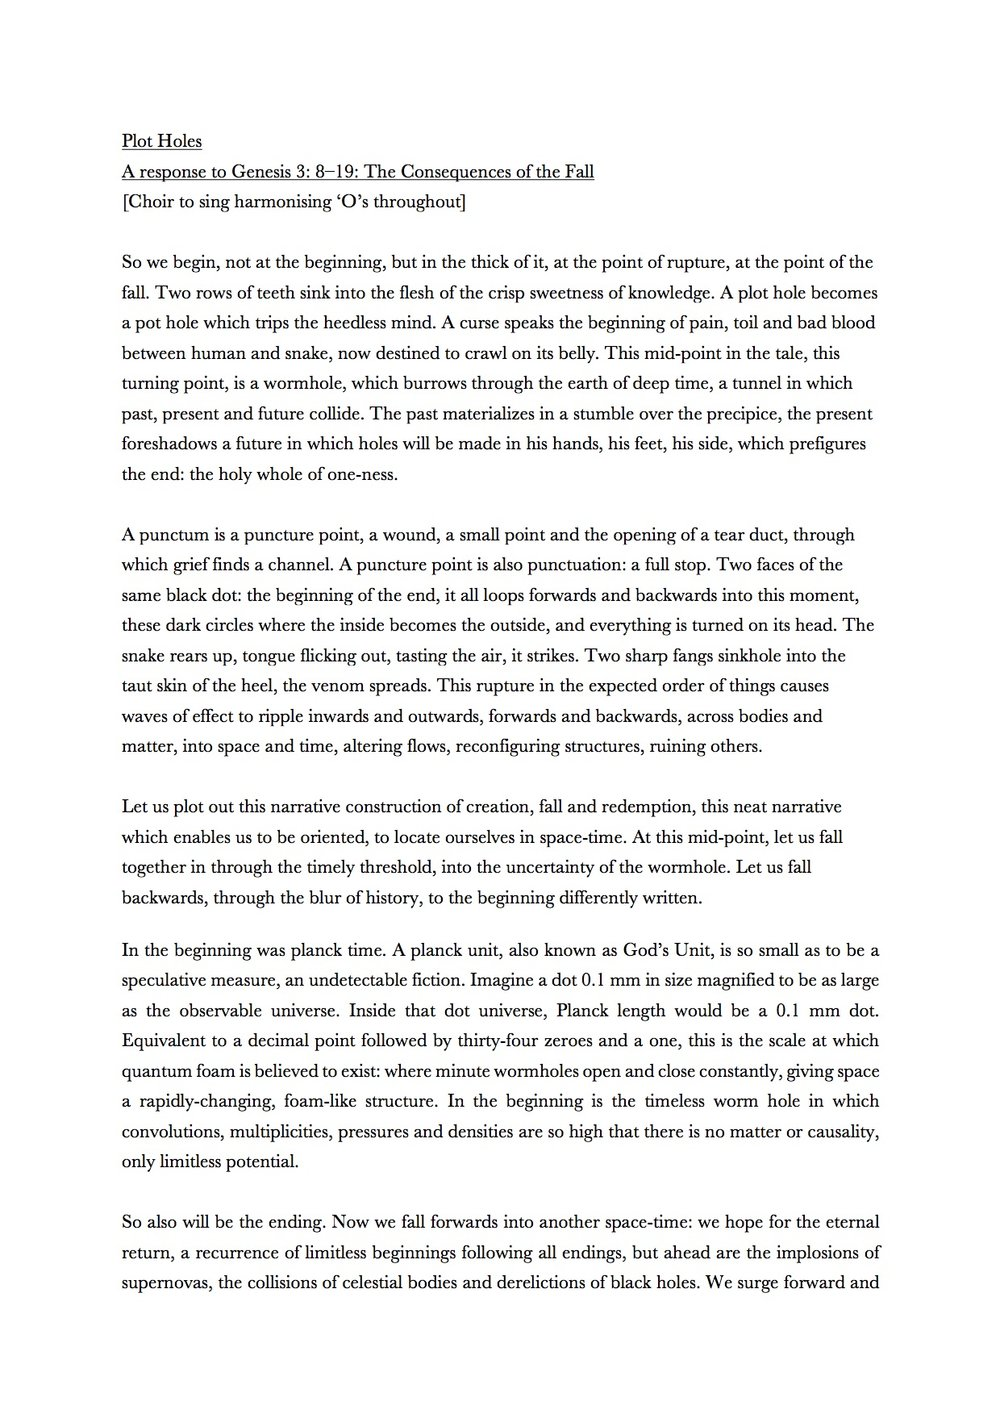 Microsoft Word - PlotHoles.docx.jpg